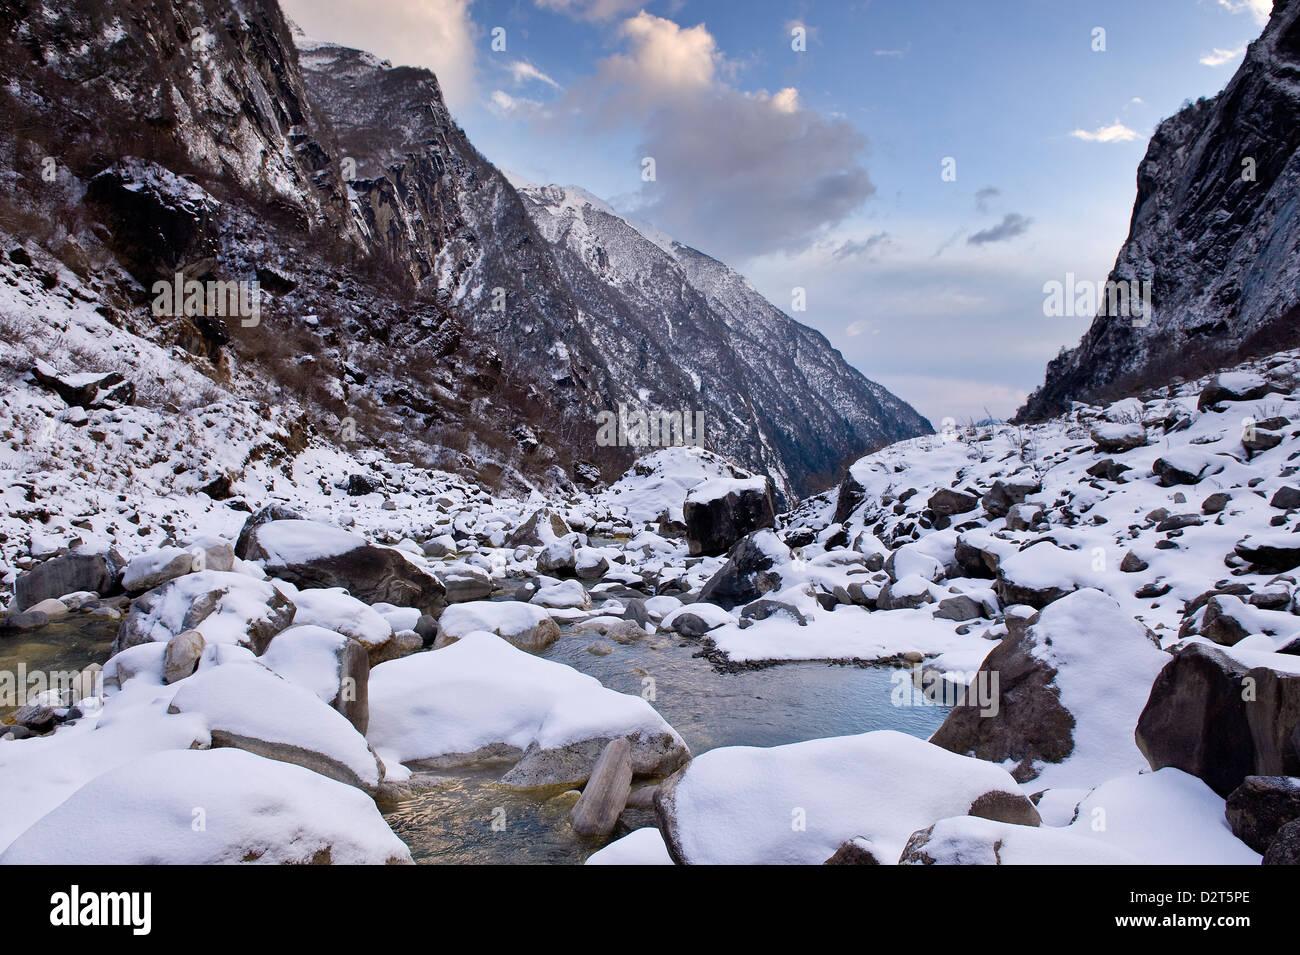 Modi Khola River, Annapurna Himal, Nepal, Himalayas, Asia - Stock Image